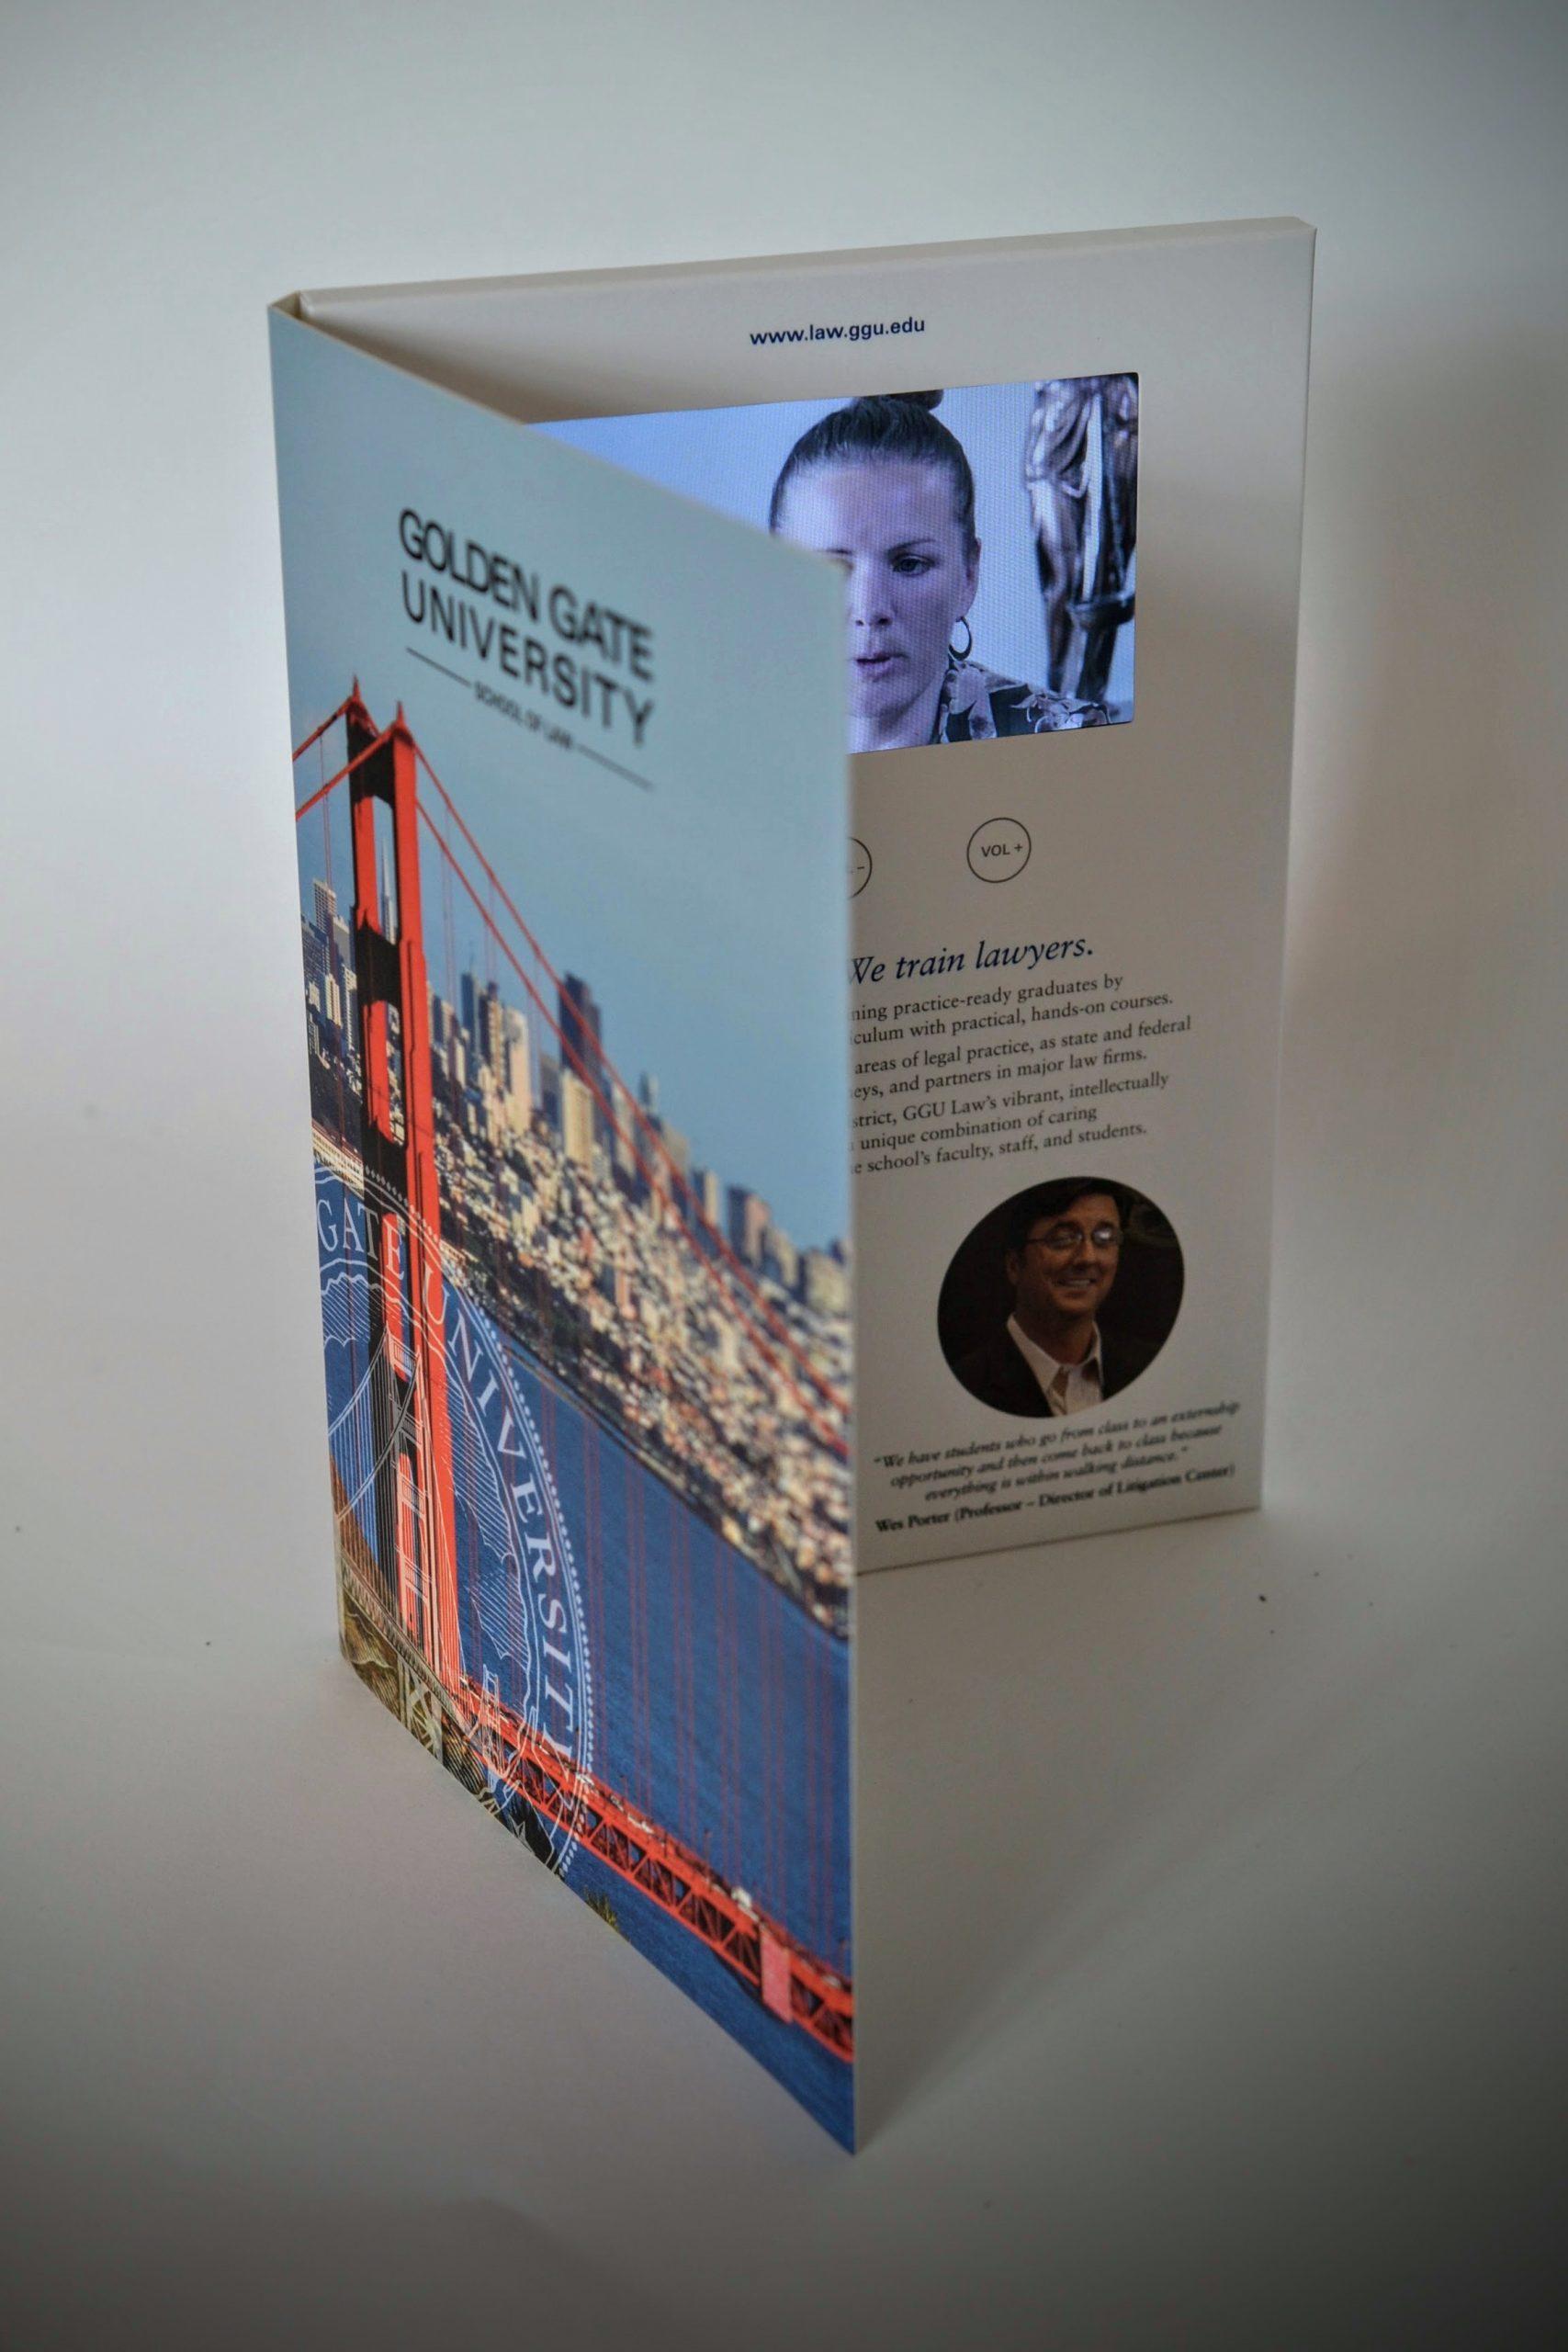 portrait video brochure 4.3-inch screen